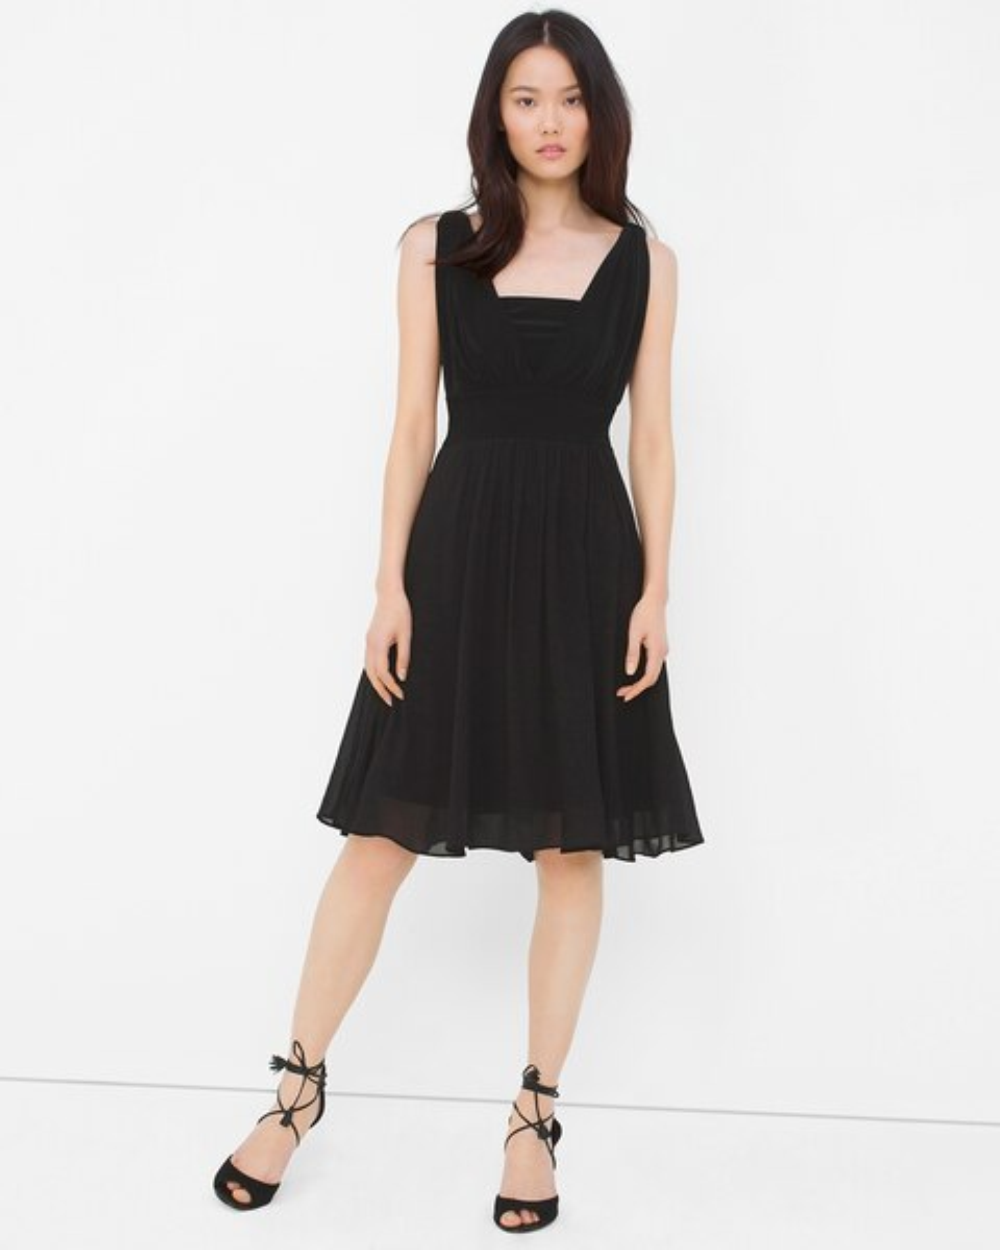 Genius Chiffon Convertible Black Dress - White House Black Market